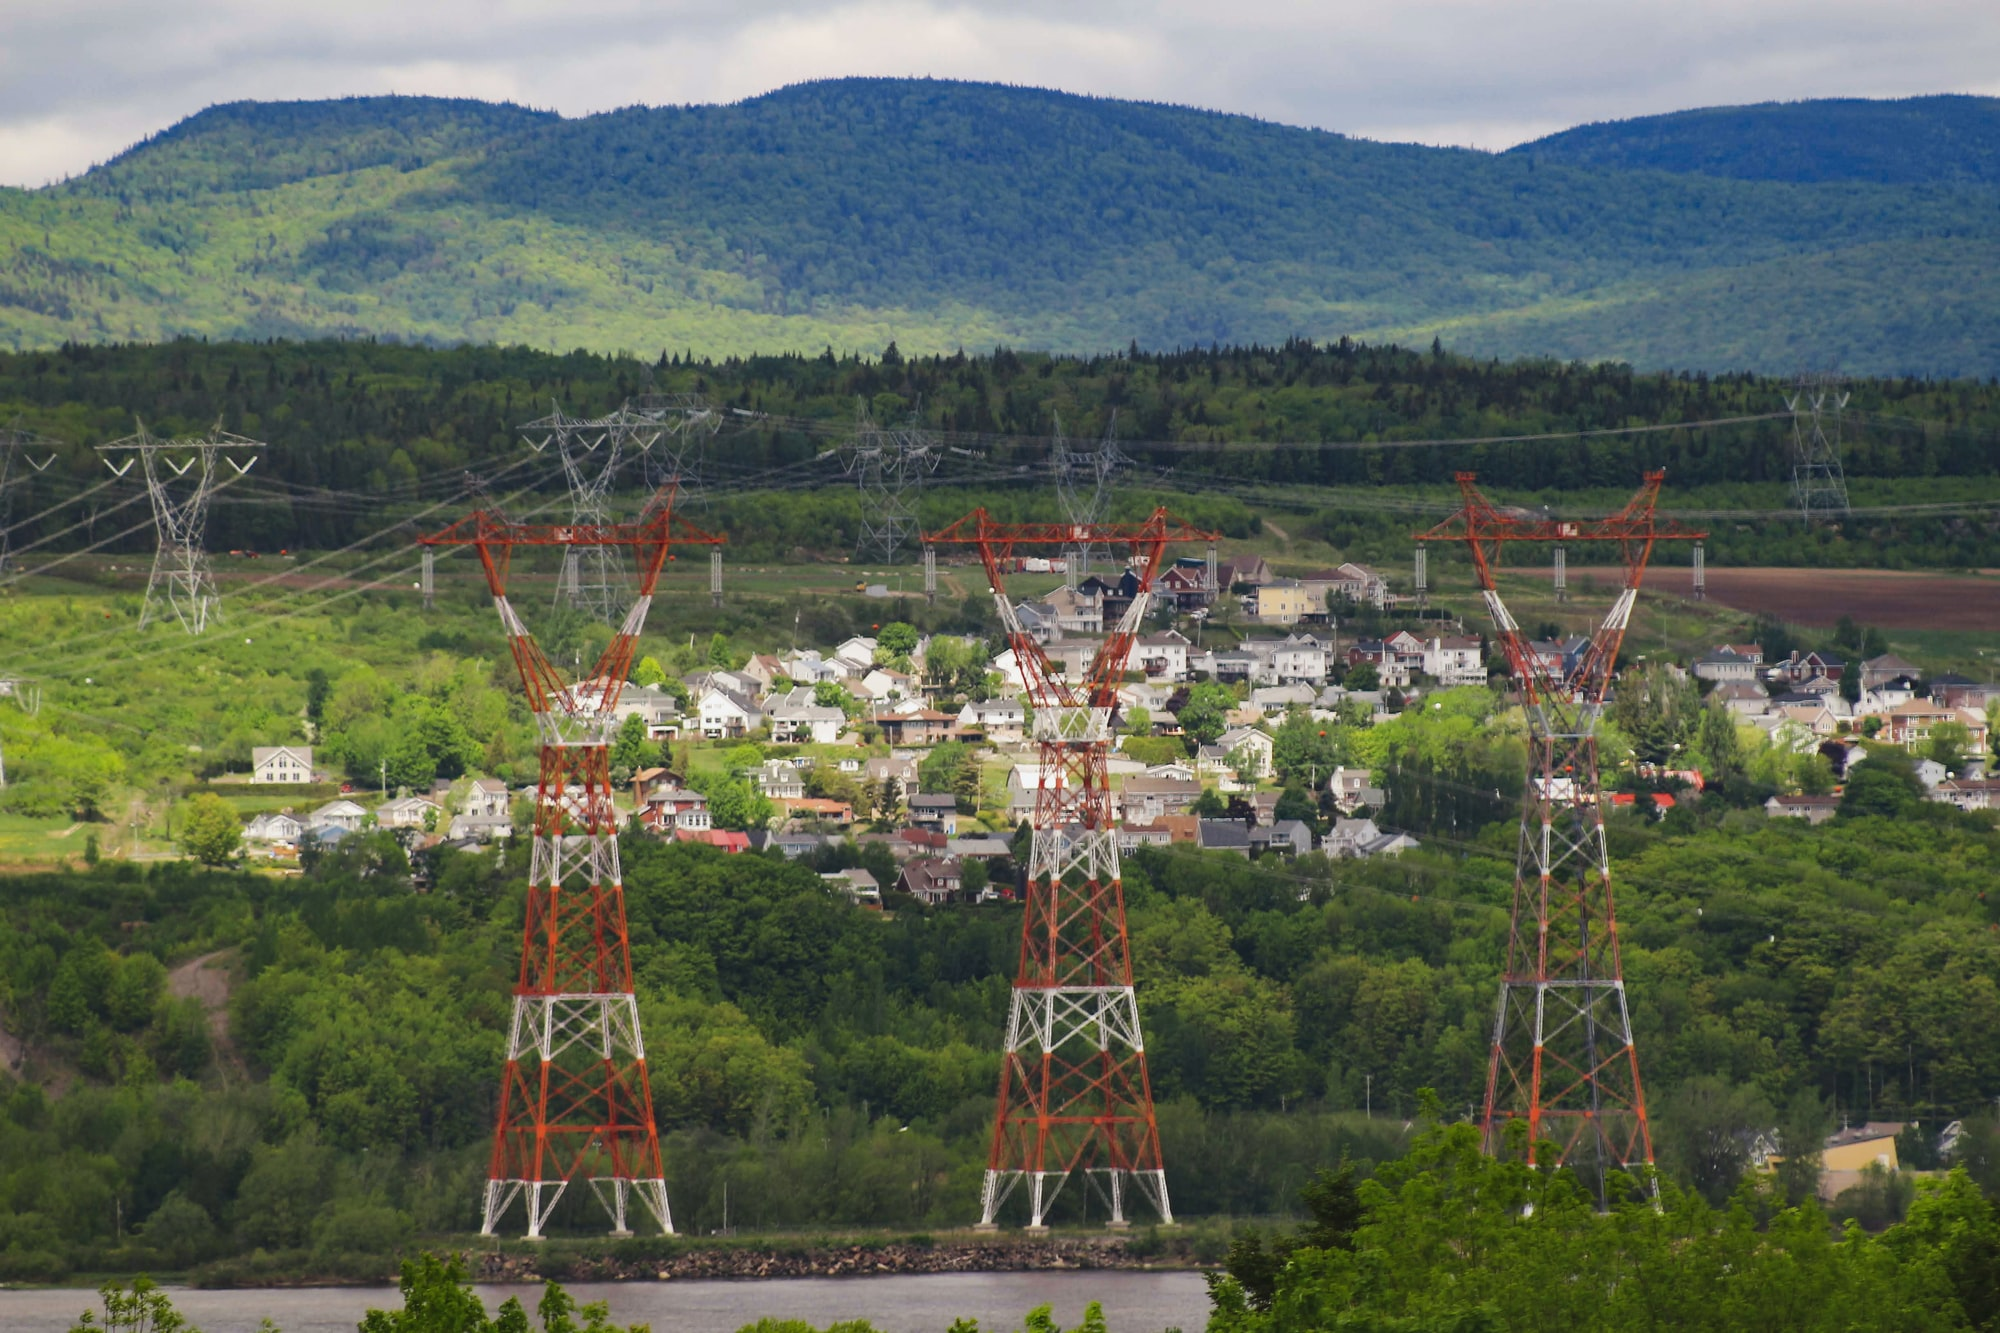 Appalachian Regional Council Grants Fund Broadband, Innovation Initiatives